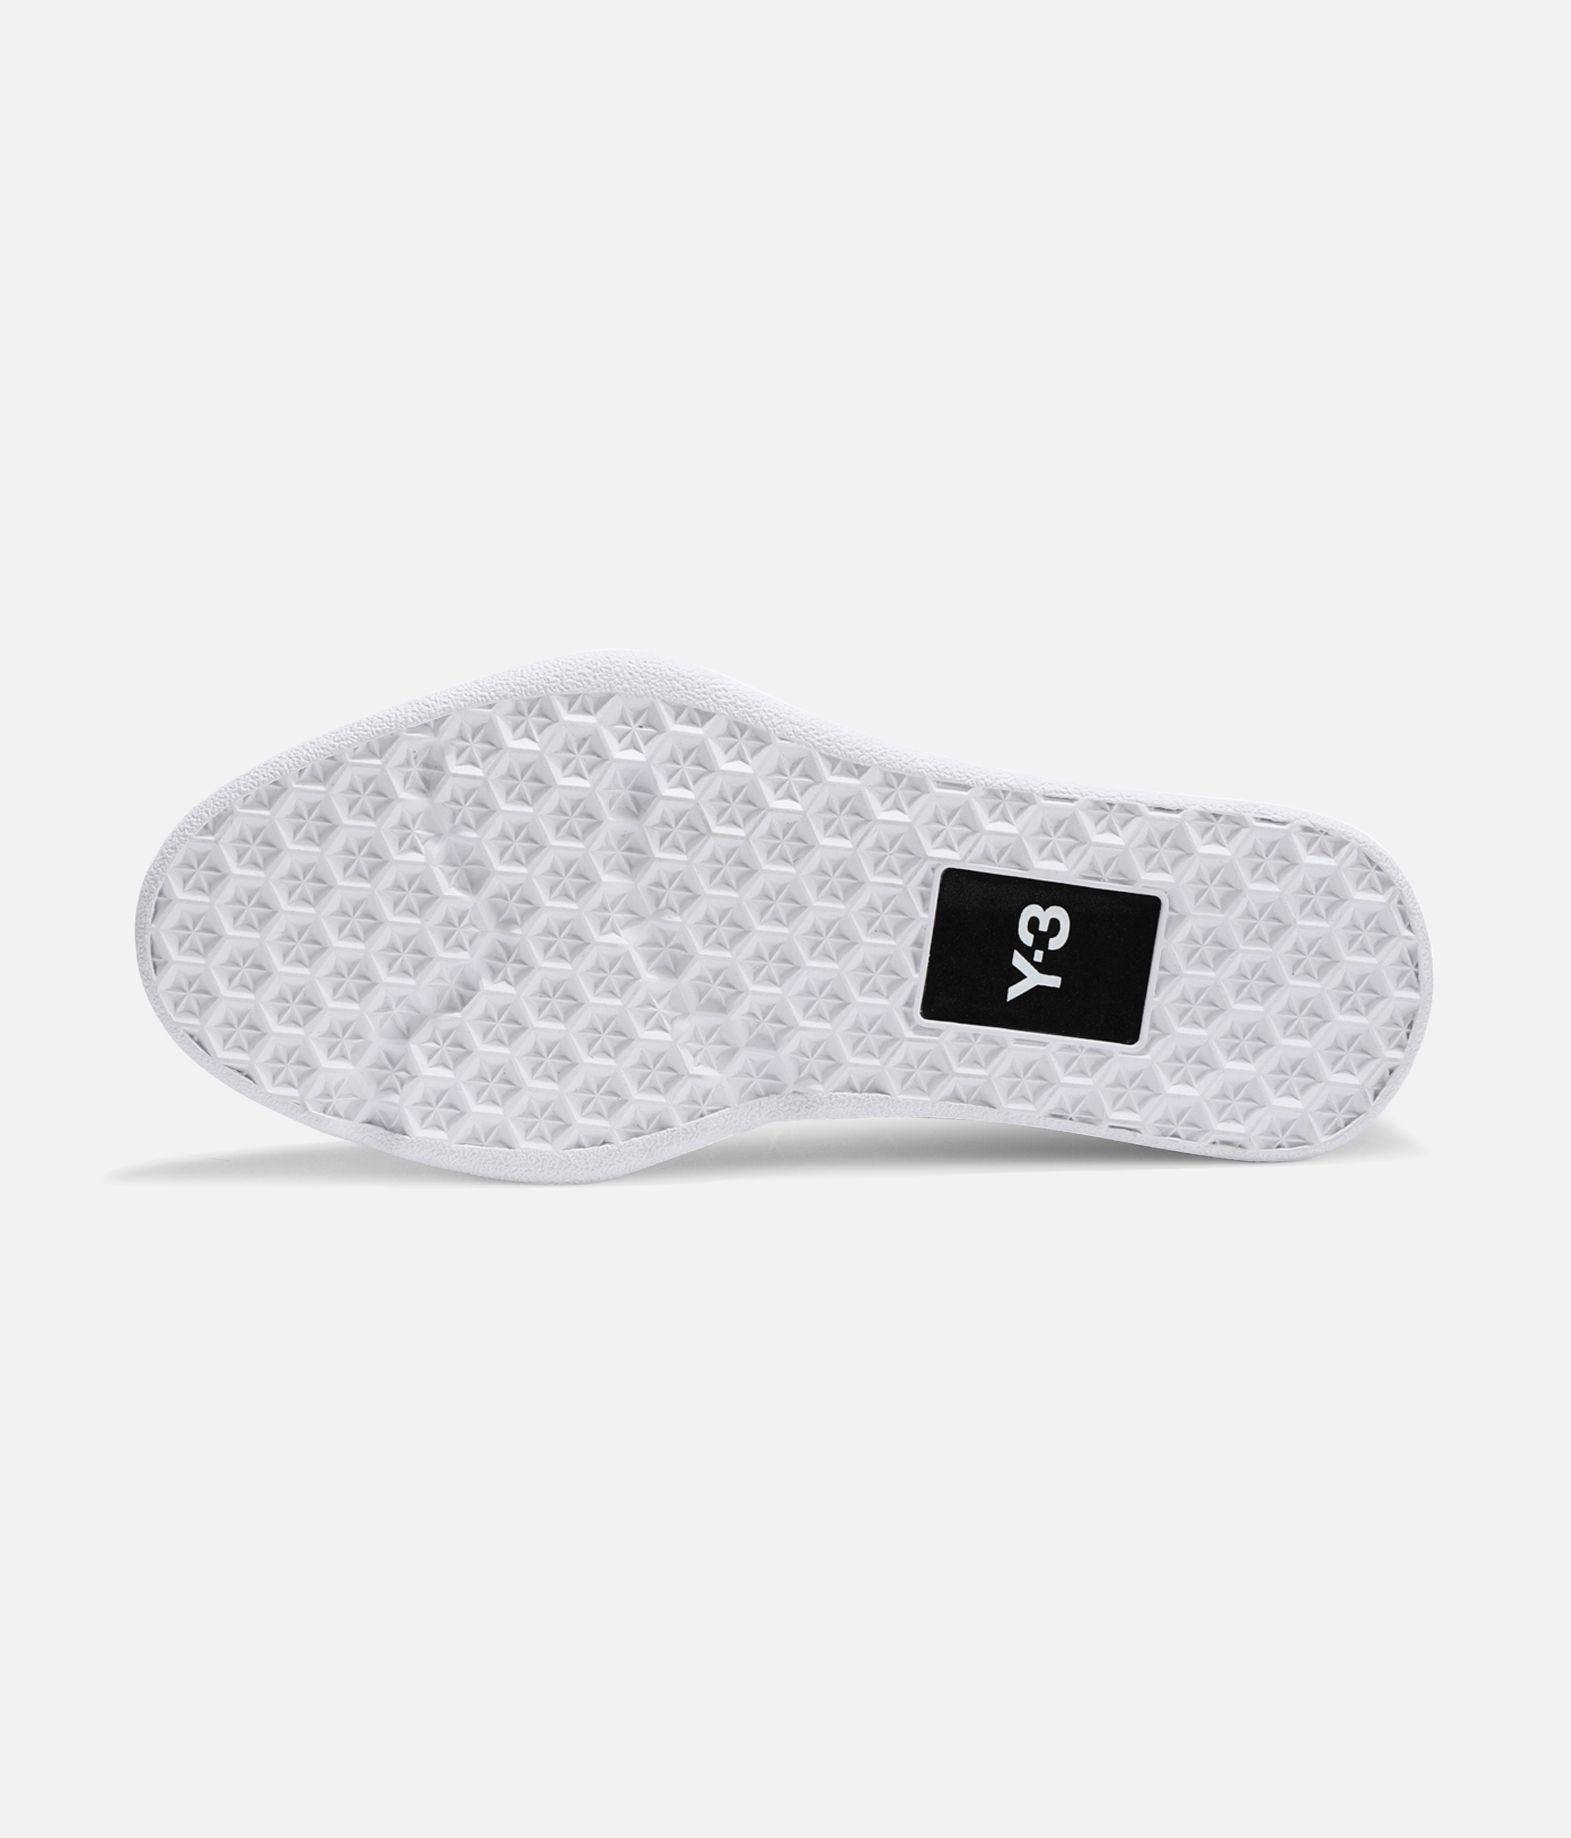 Y-3 Y-3 Bashyo Sneakers alte E a